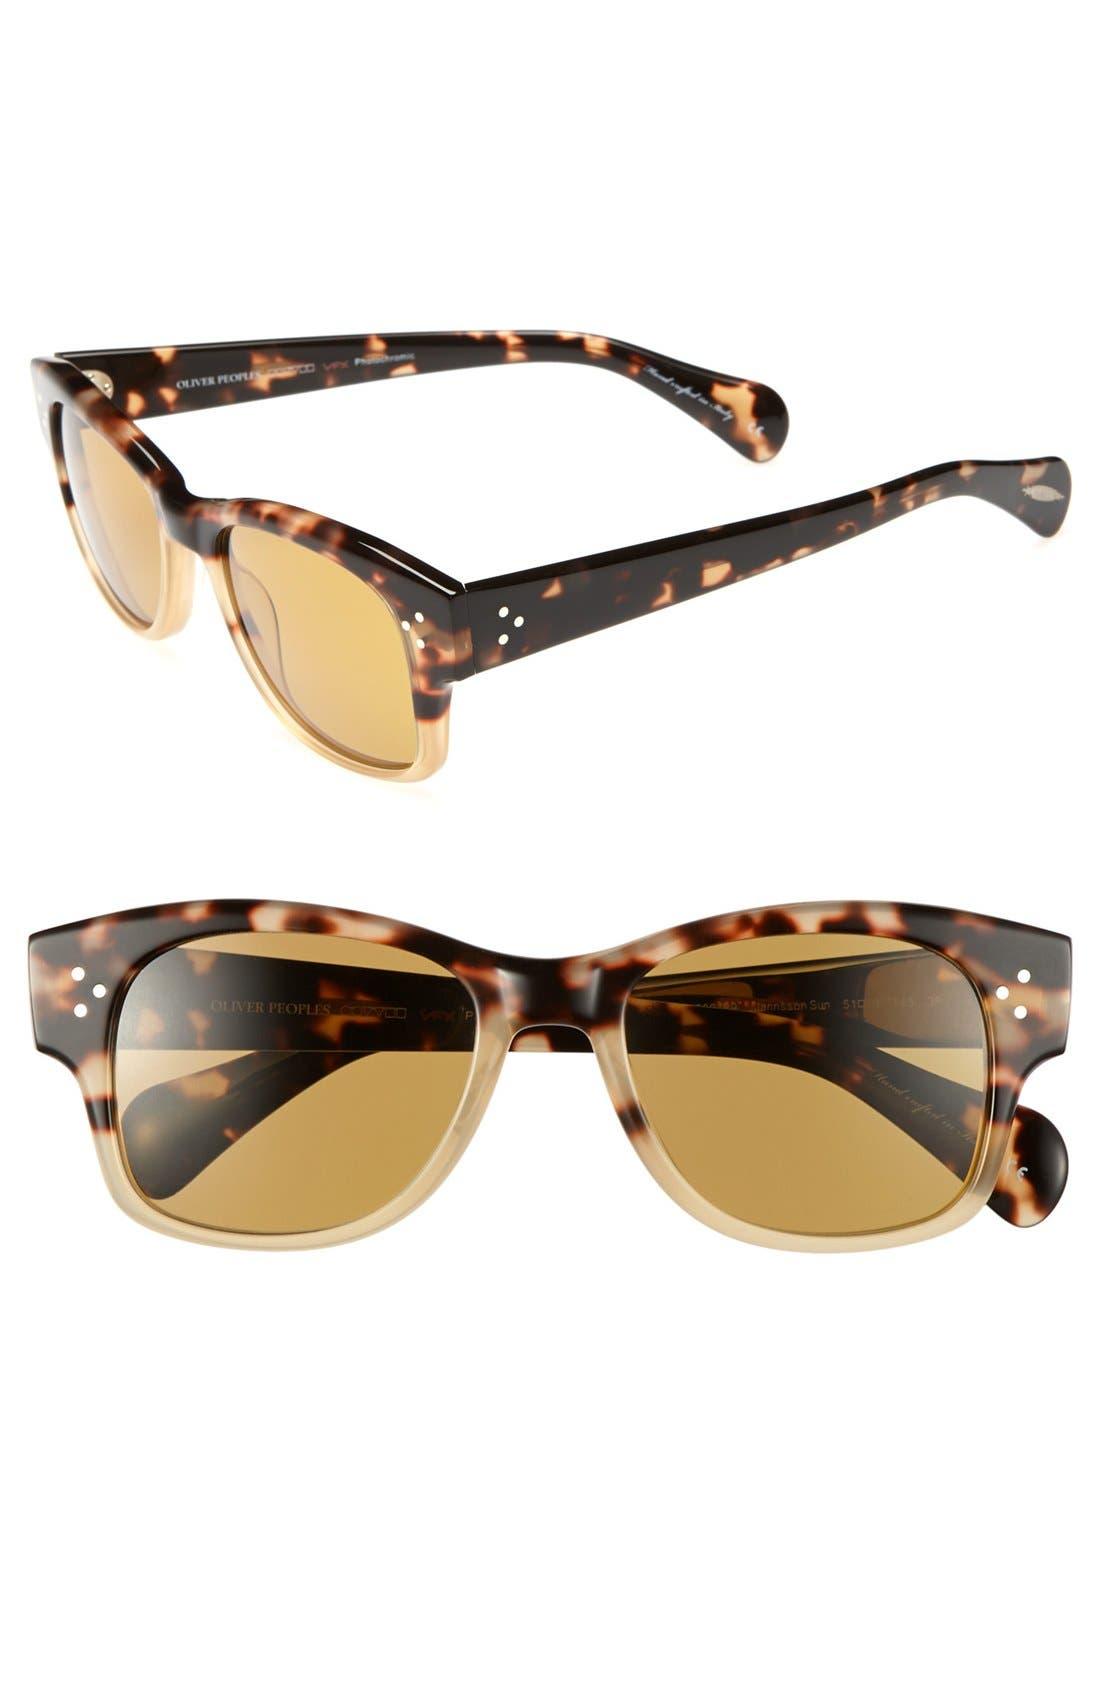 Alternate Image 1 Selected - Oliver Peoples 'Jannsson' 51mm Sunglasses